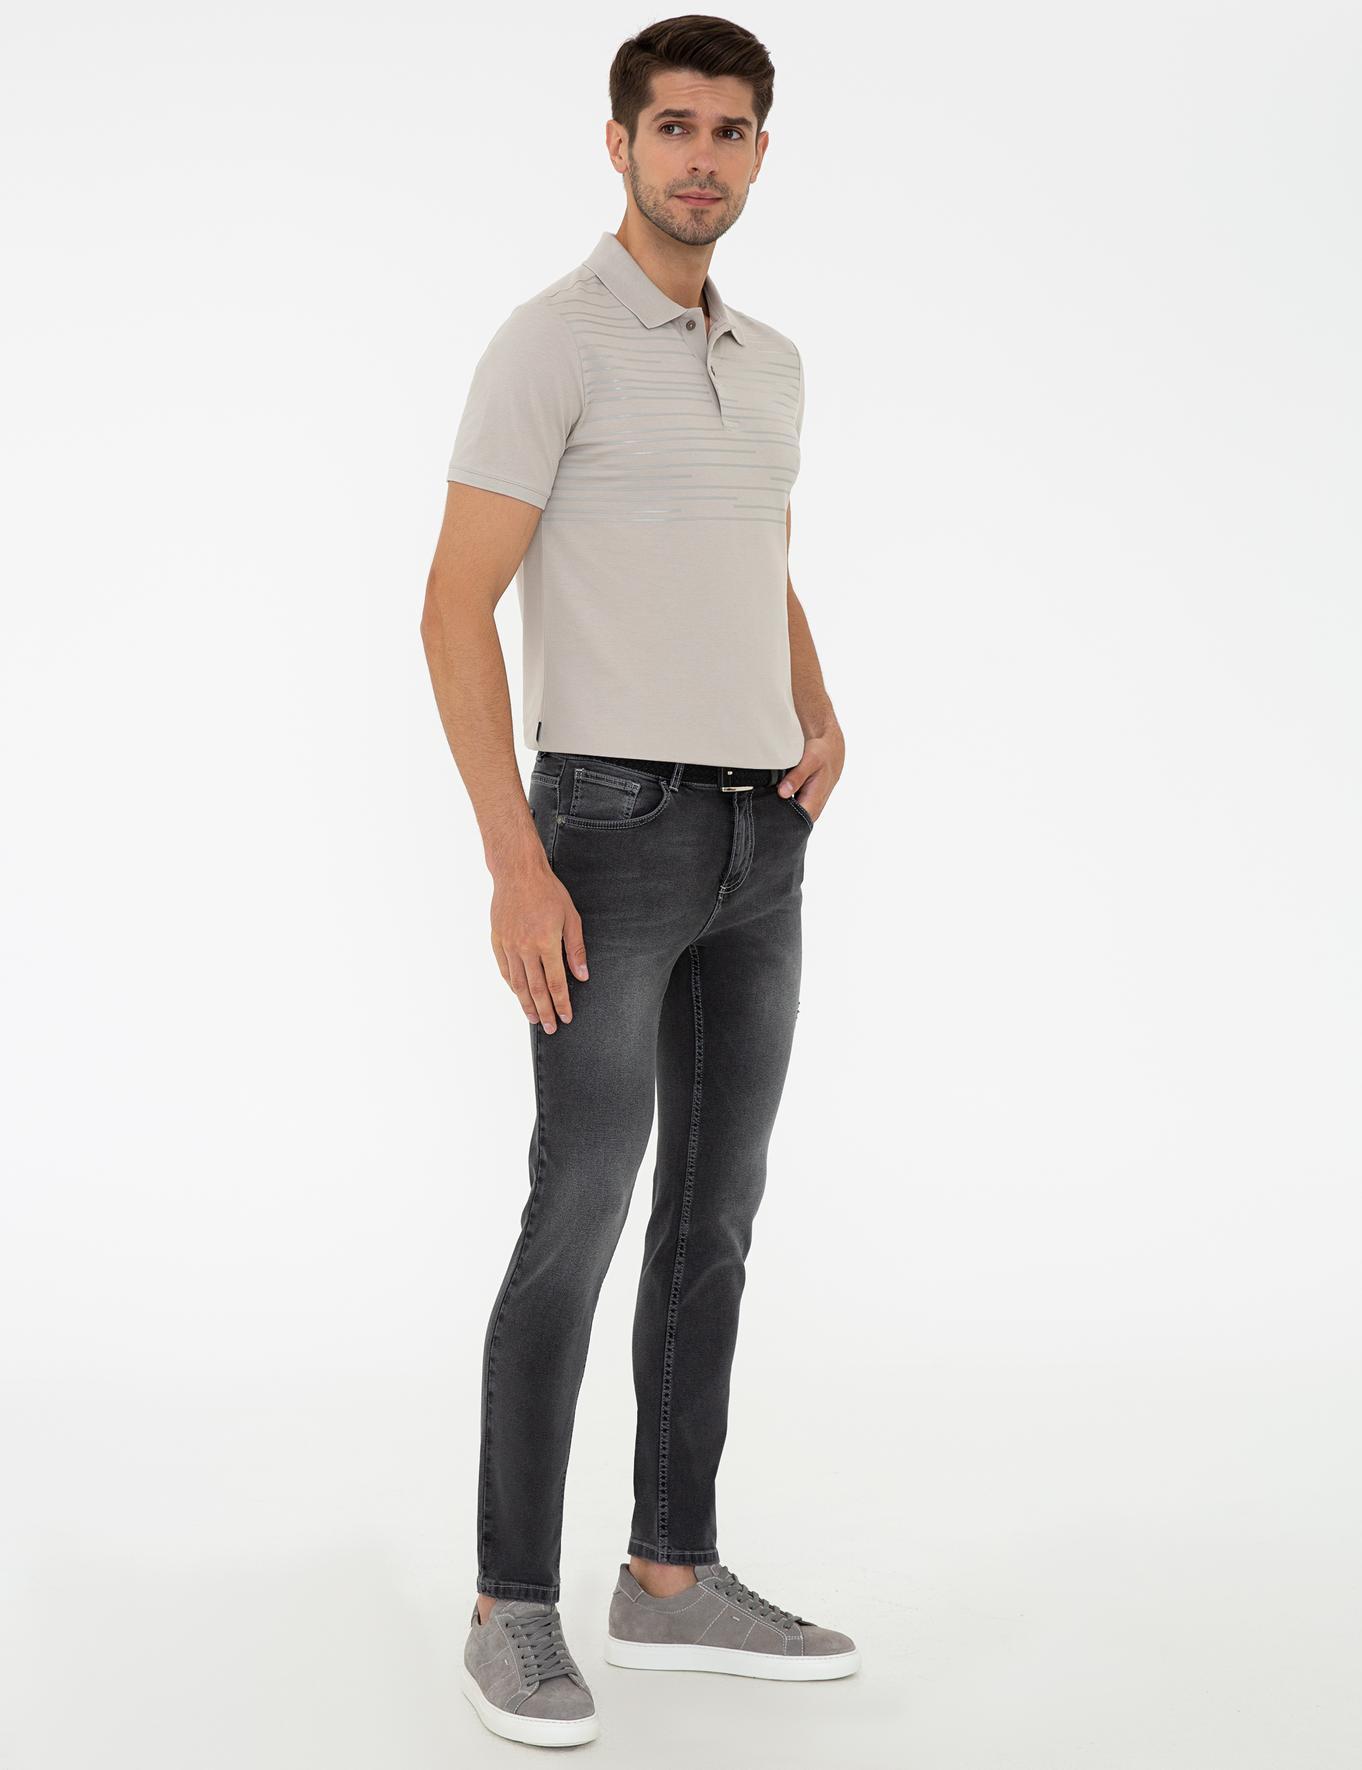 Koyu Gri Slim Fit Denim Pantolon